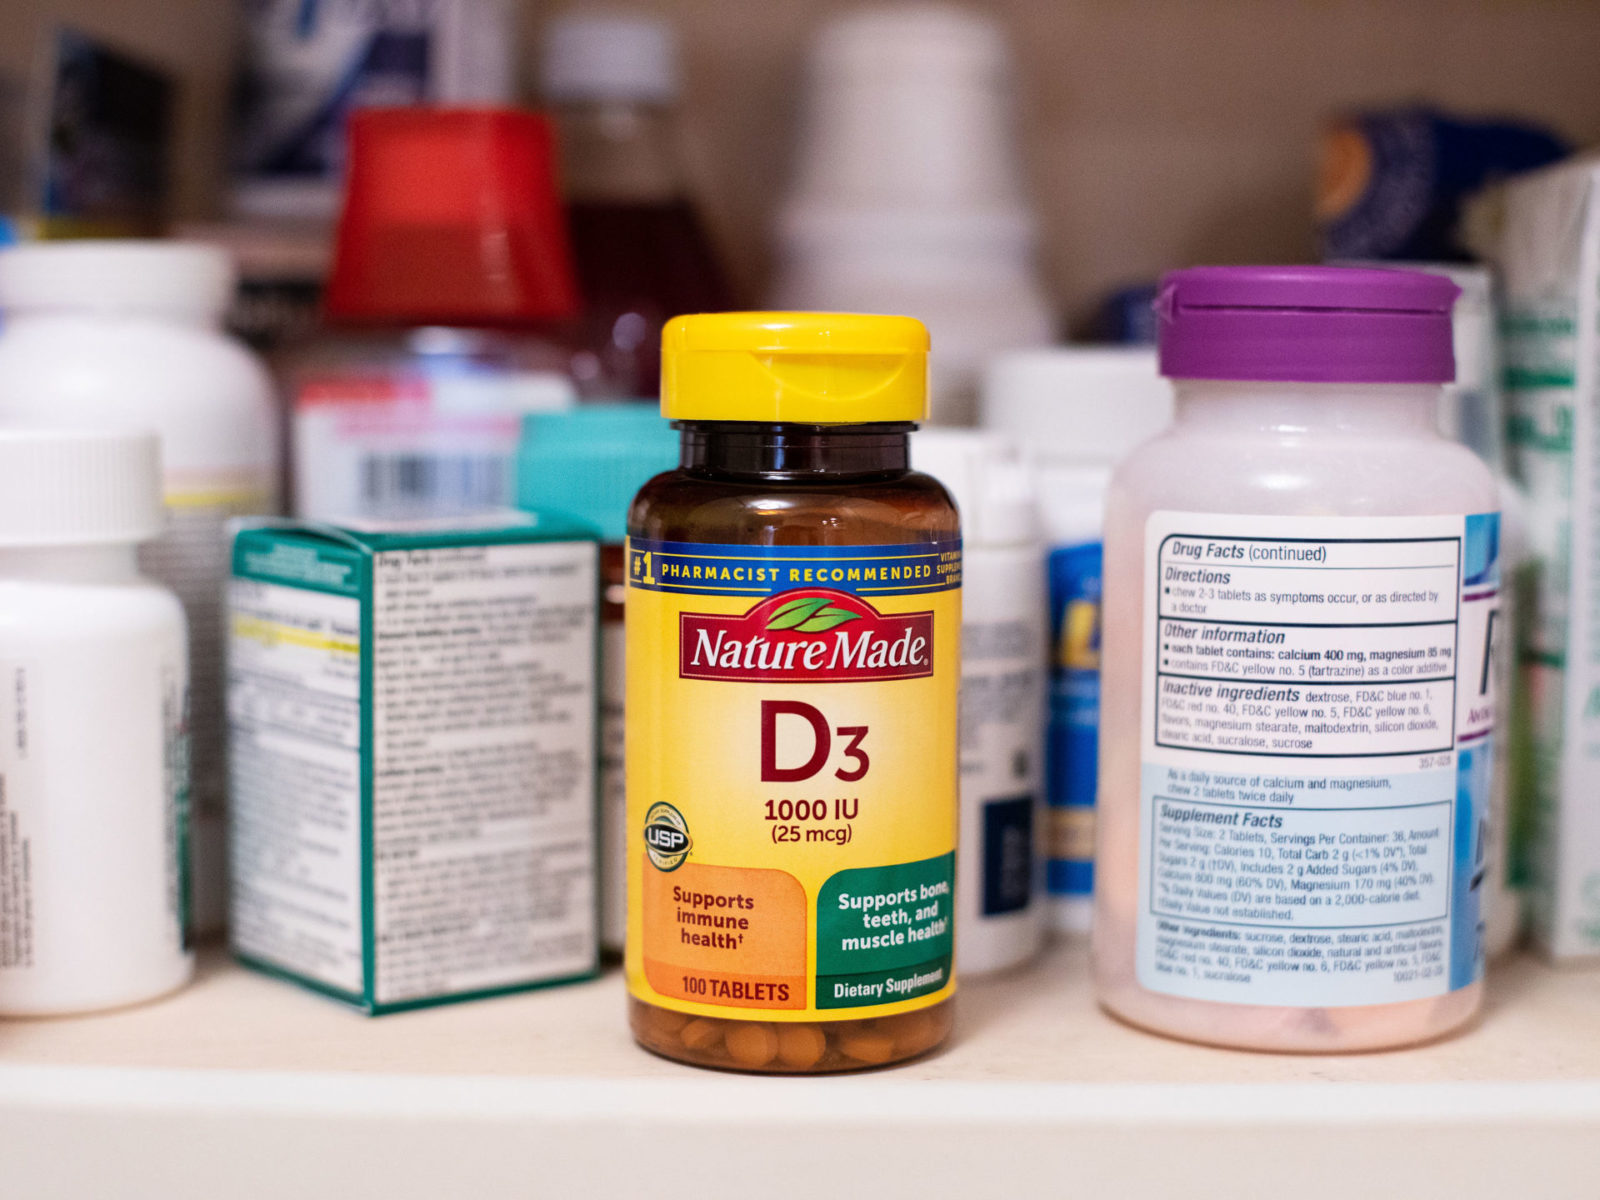 Nature Made Vitamins Just $ At Kroger